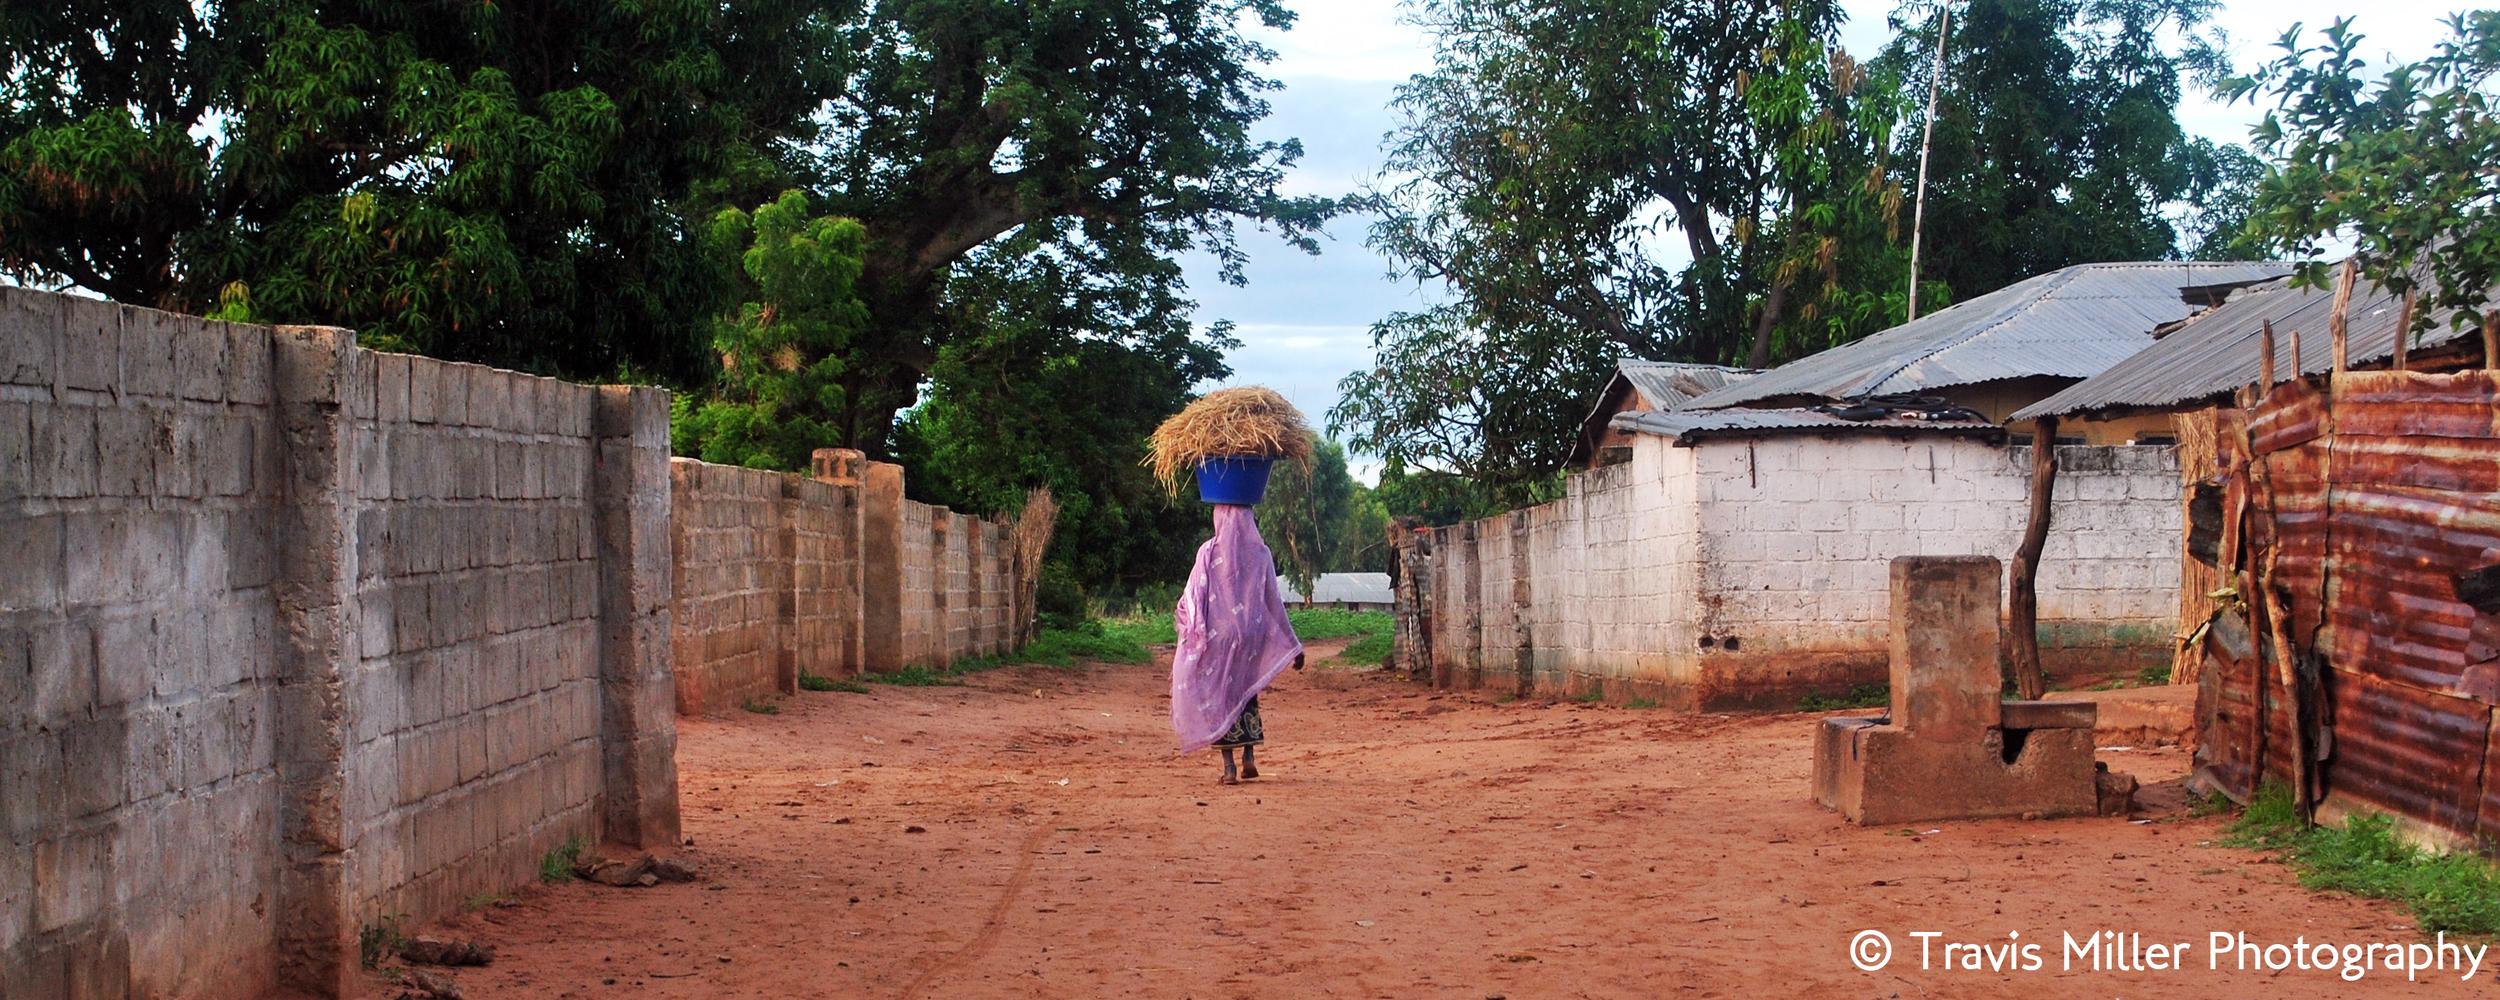 Bringing Home the Rice    Pakalingding, The Gambia